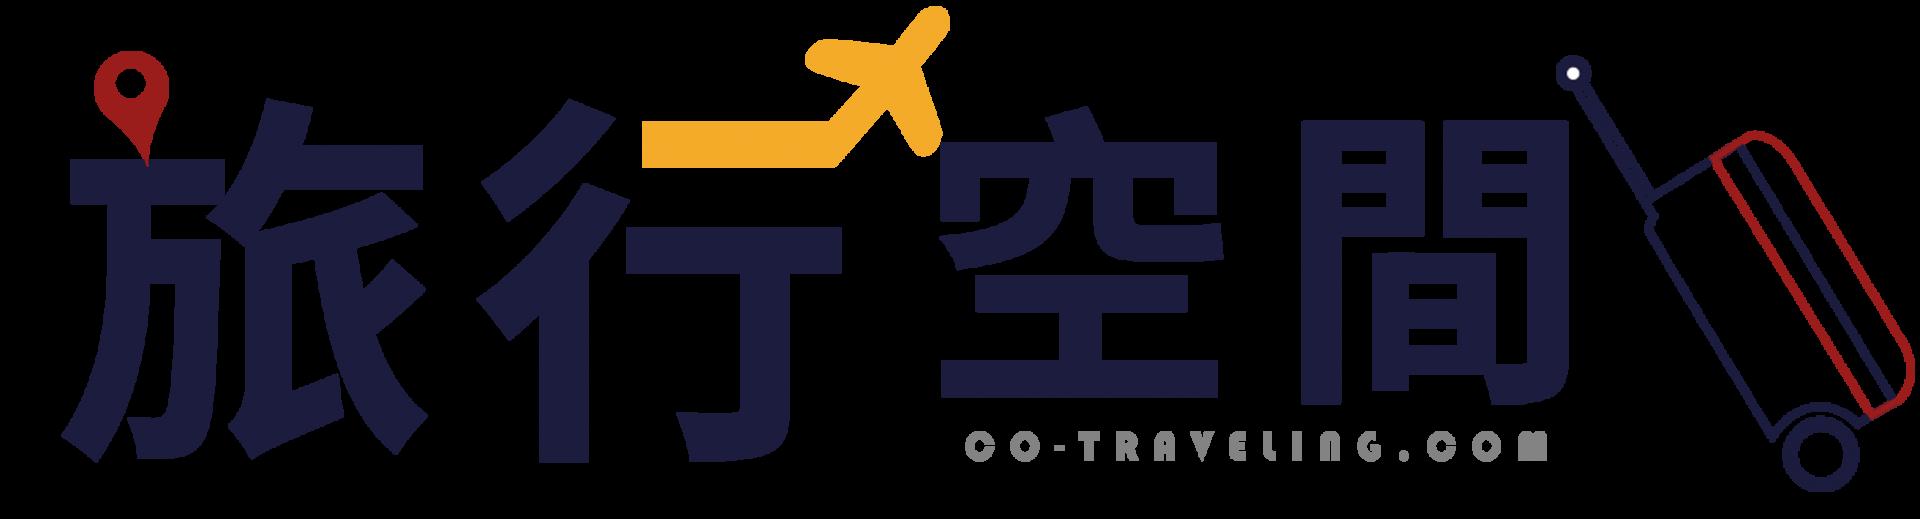 旅行空間 Co-Traveling